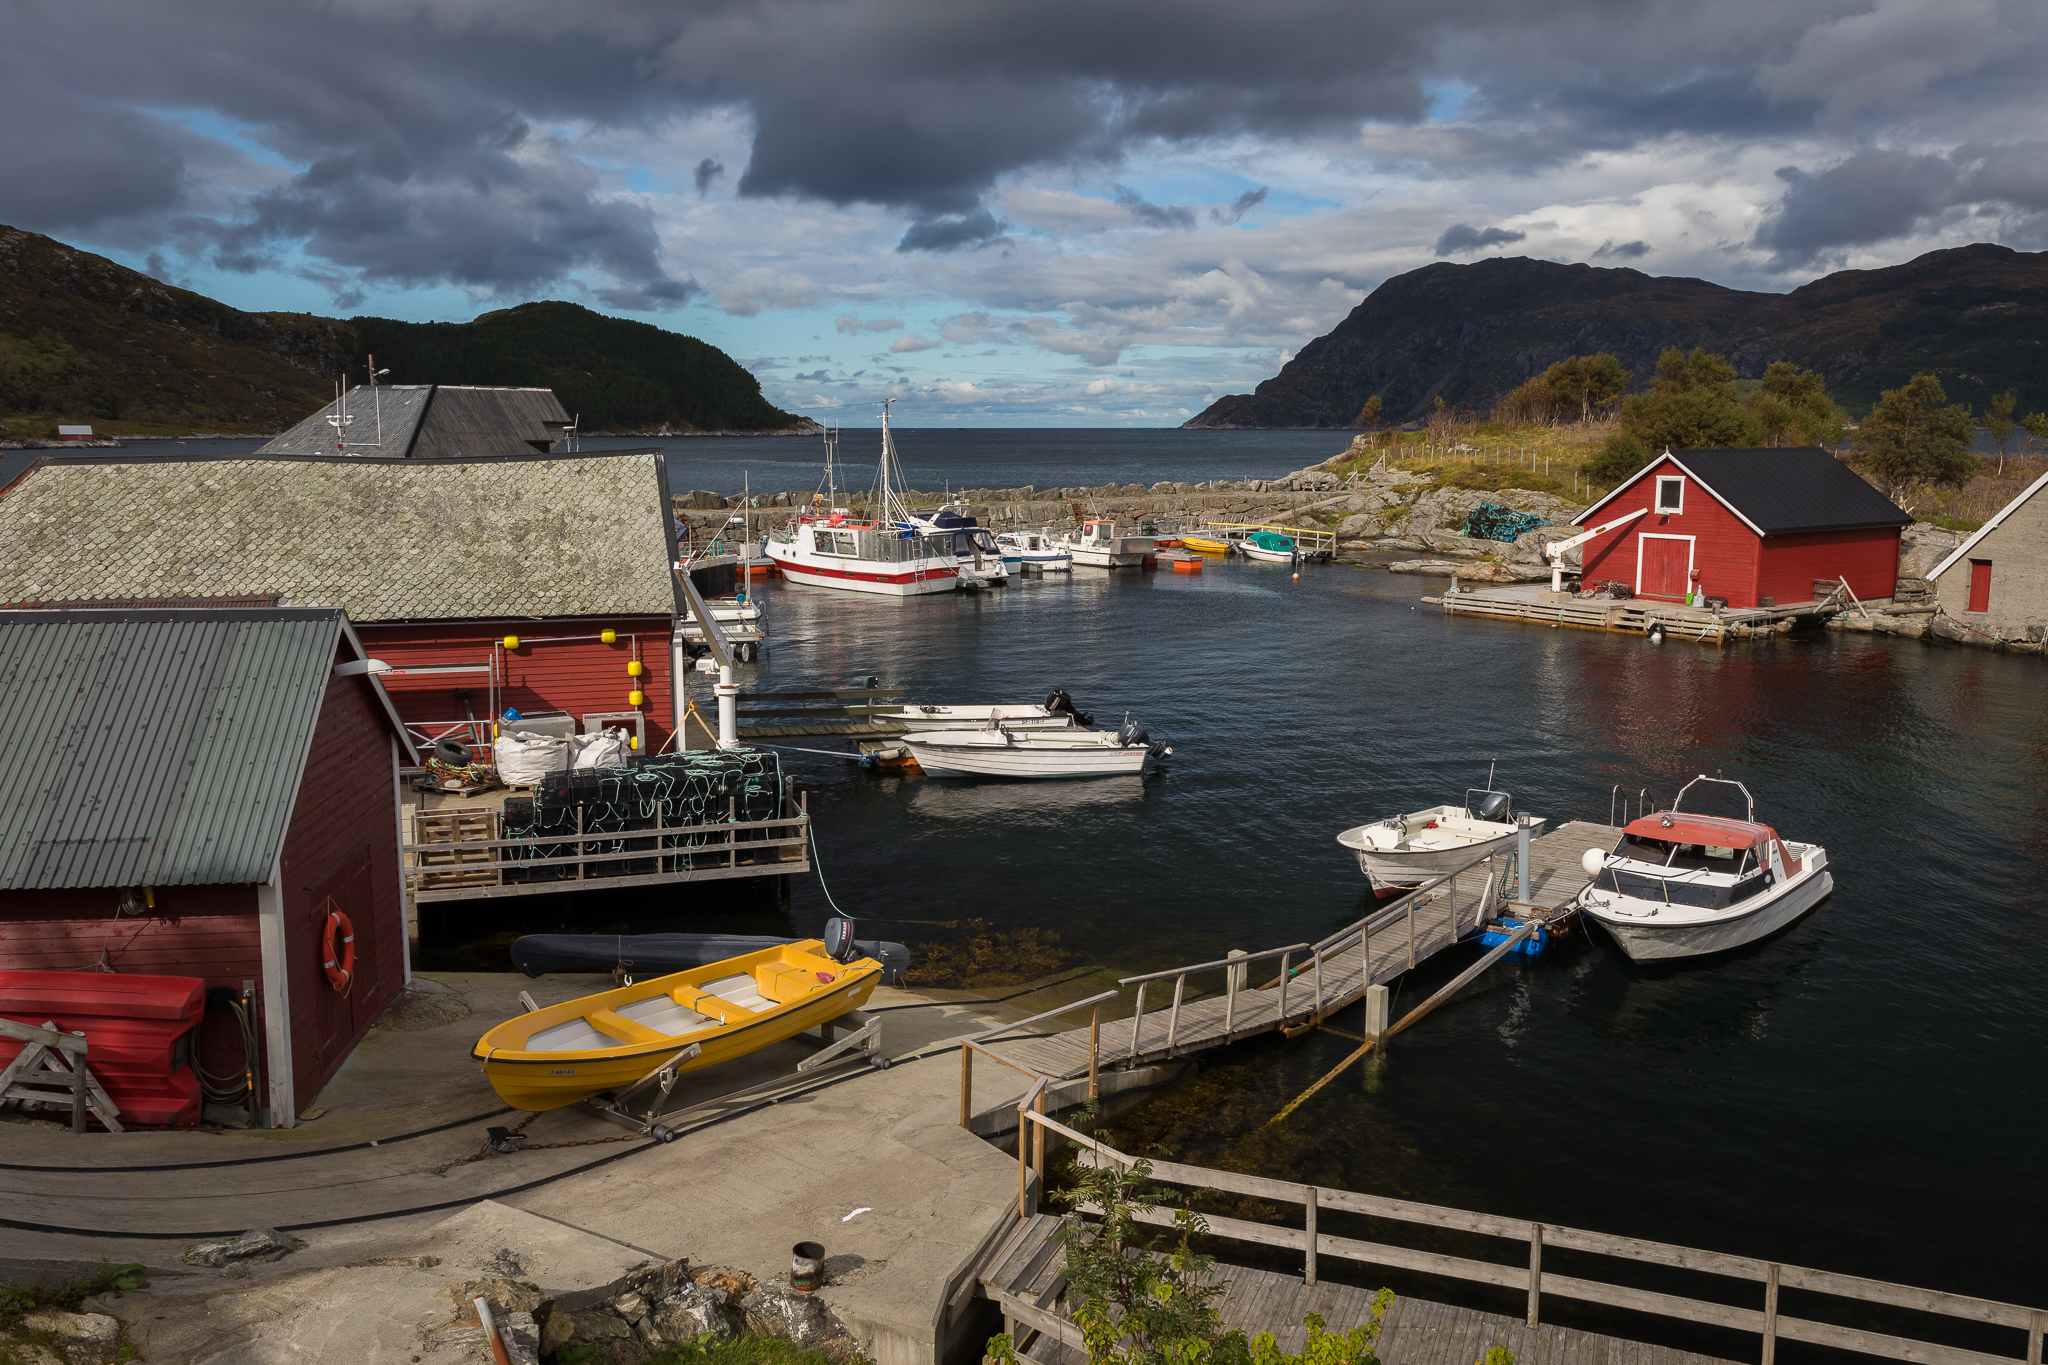 The harbor in Husevåg, Norway